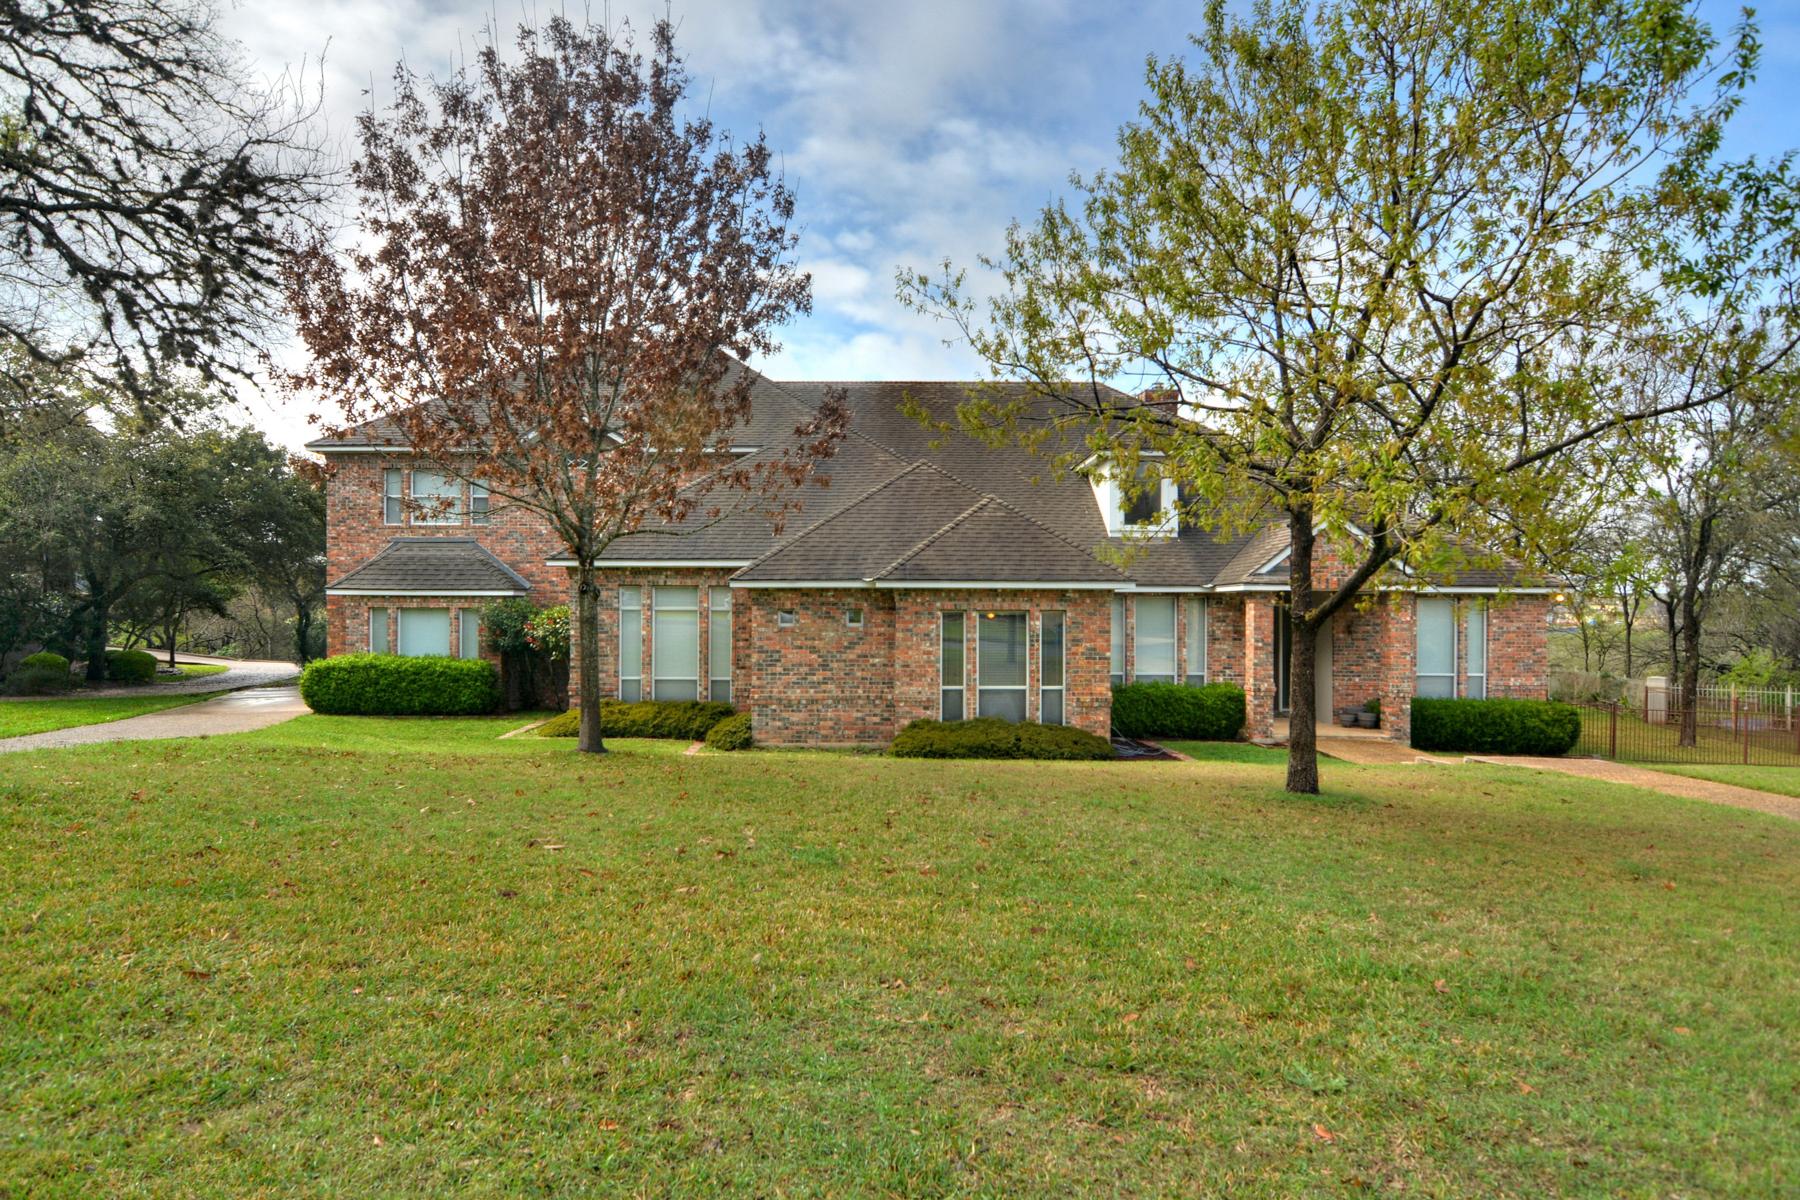 Vivienda unifamiliar por un Venta en Beautiful Home in Fair Oaks Ranch 29825 Windchime Hill Fair Oaks Ranch, Texas 78015 Estados Unidos